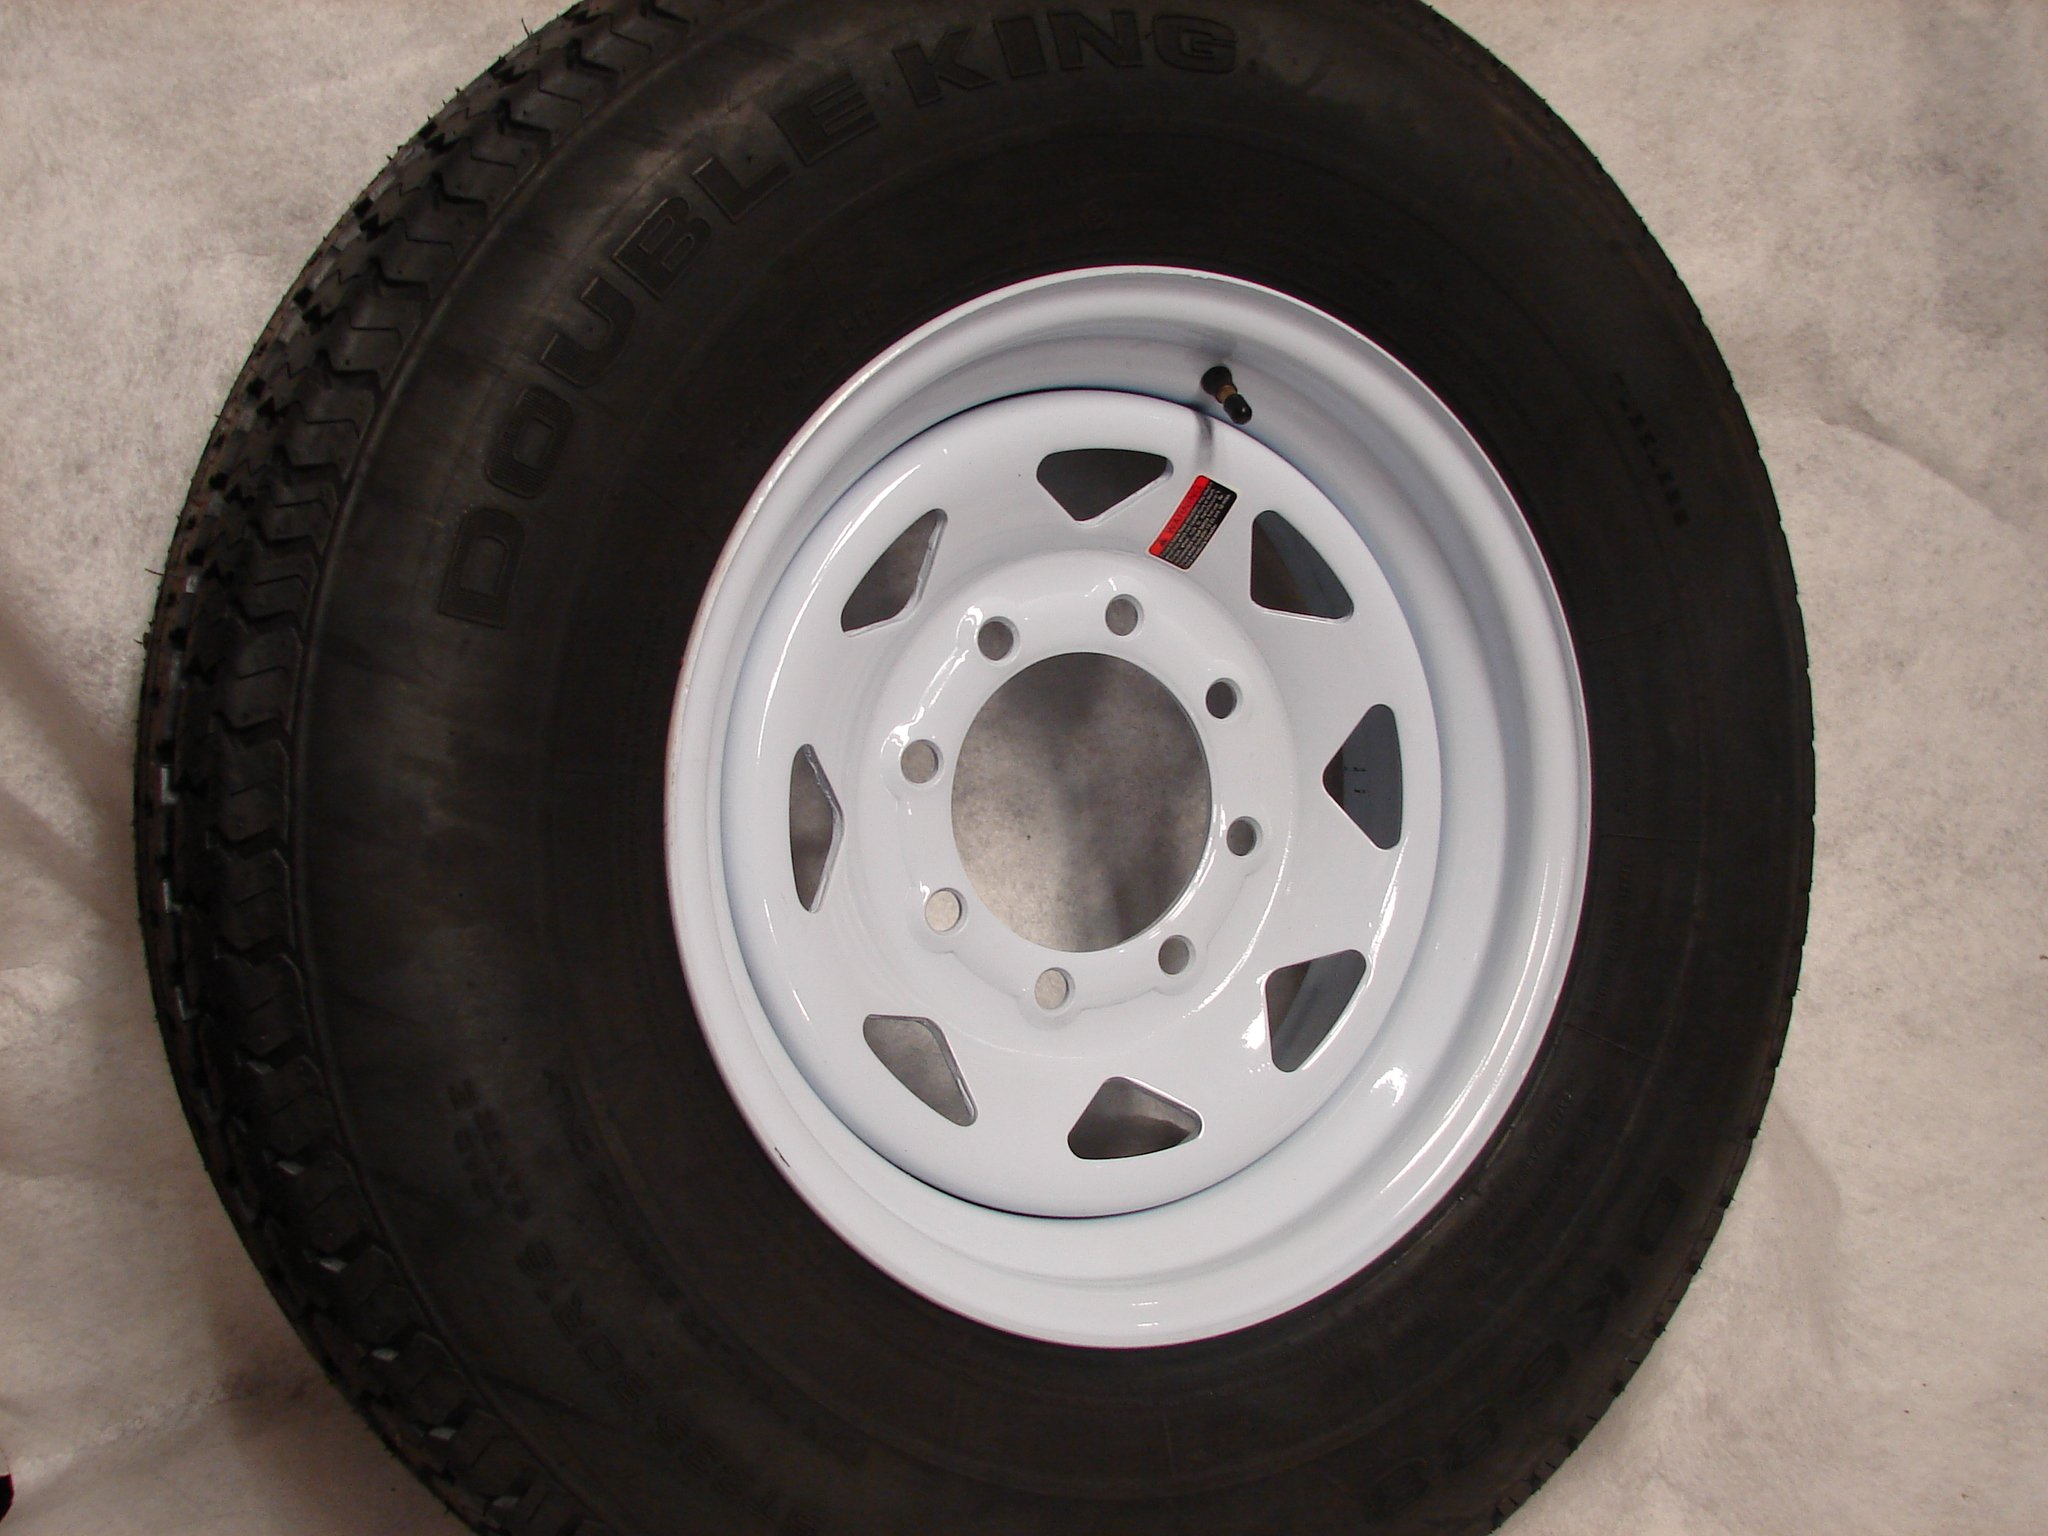 16'' White Spoke Trailer Wheel 8 Lug with Radial ST235/80R16 Tire Mounted (8x6.5) bolt circle